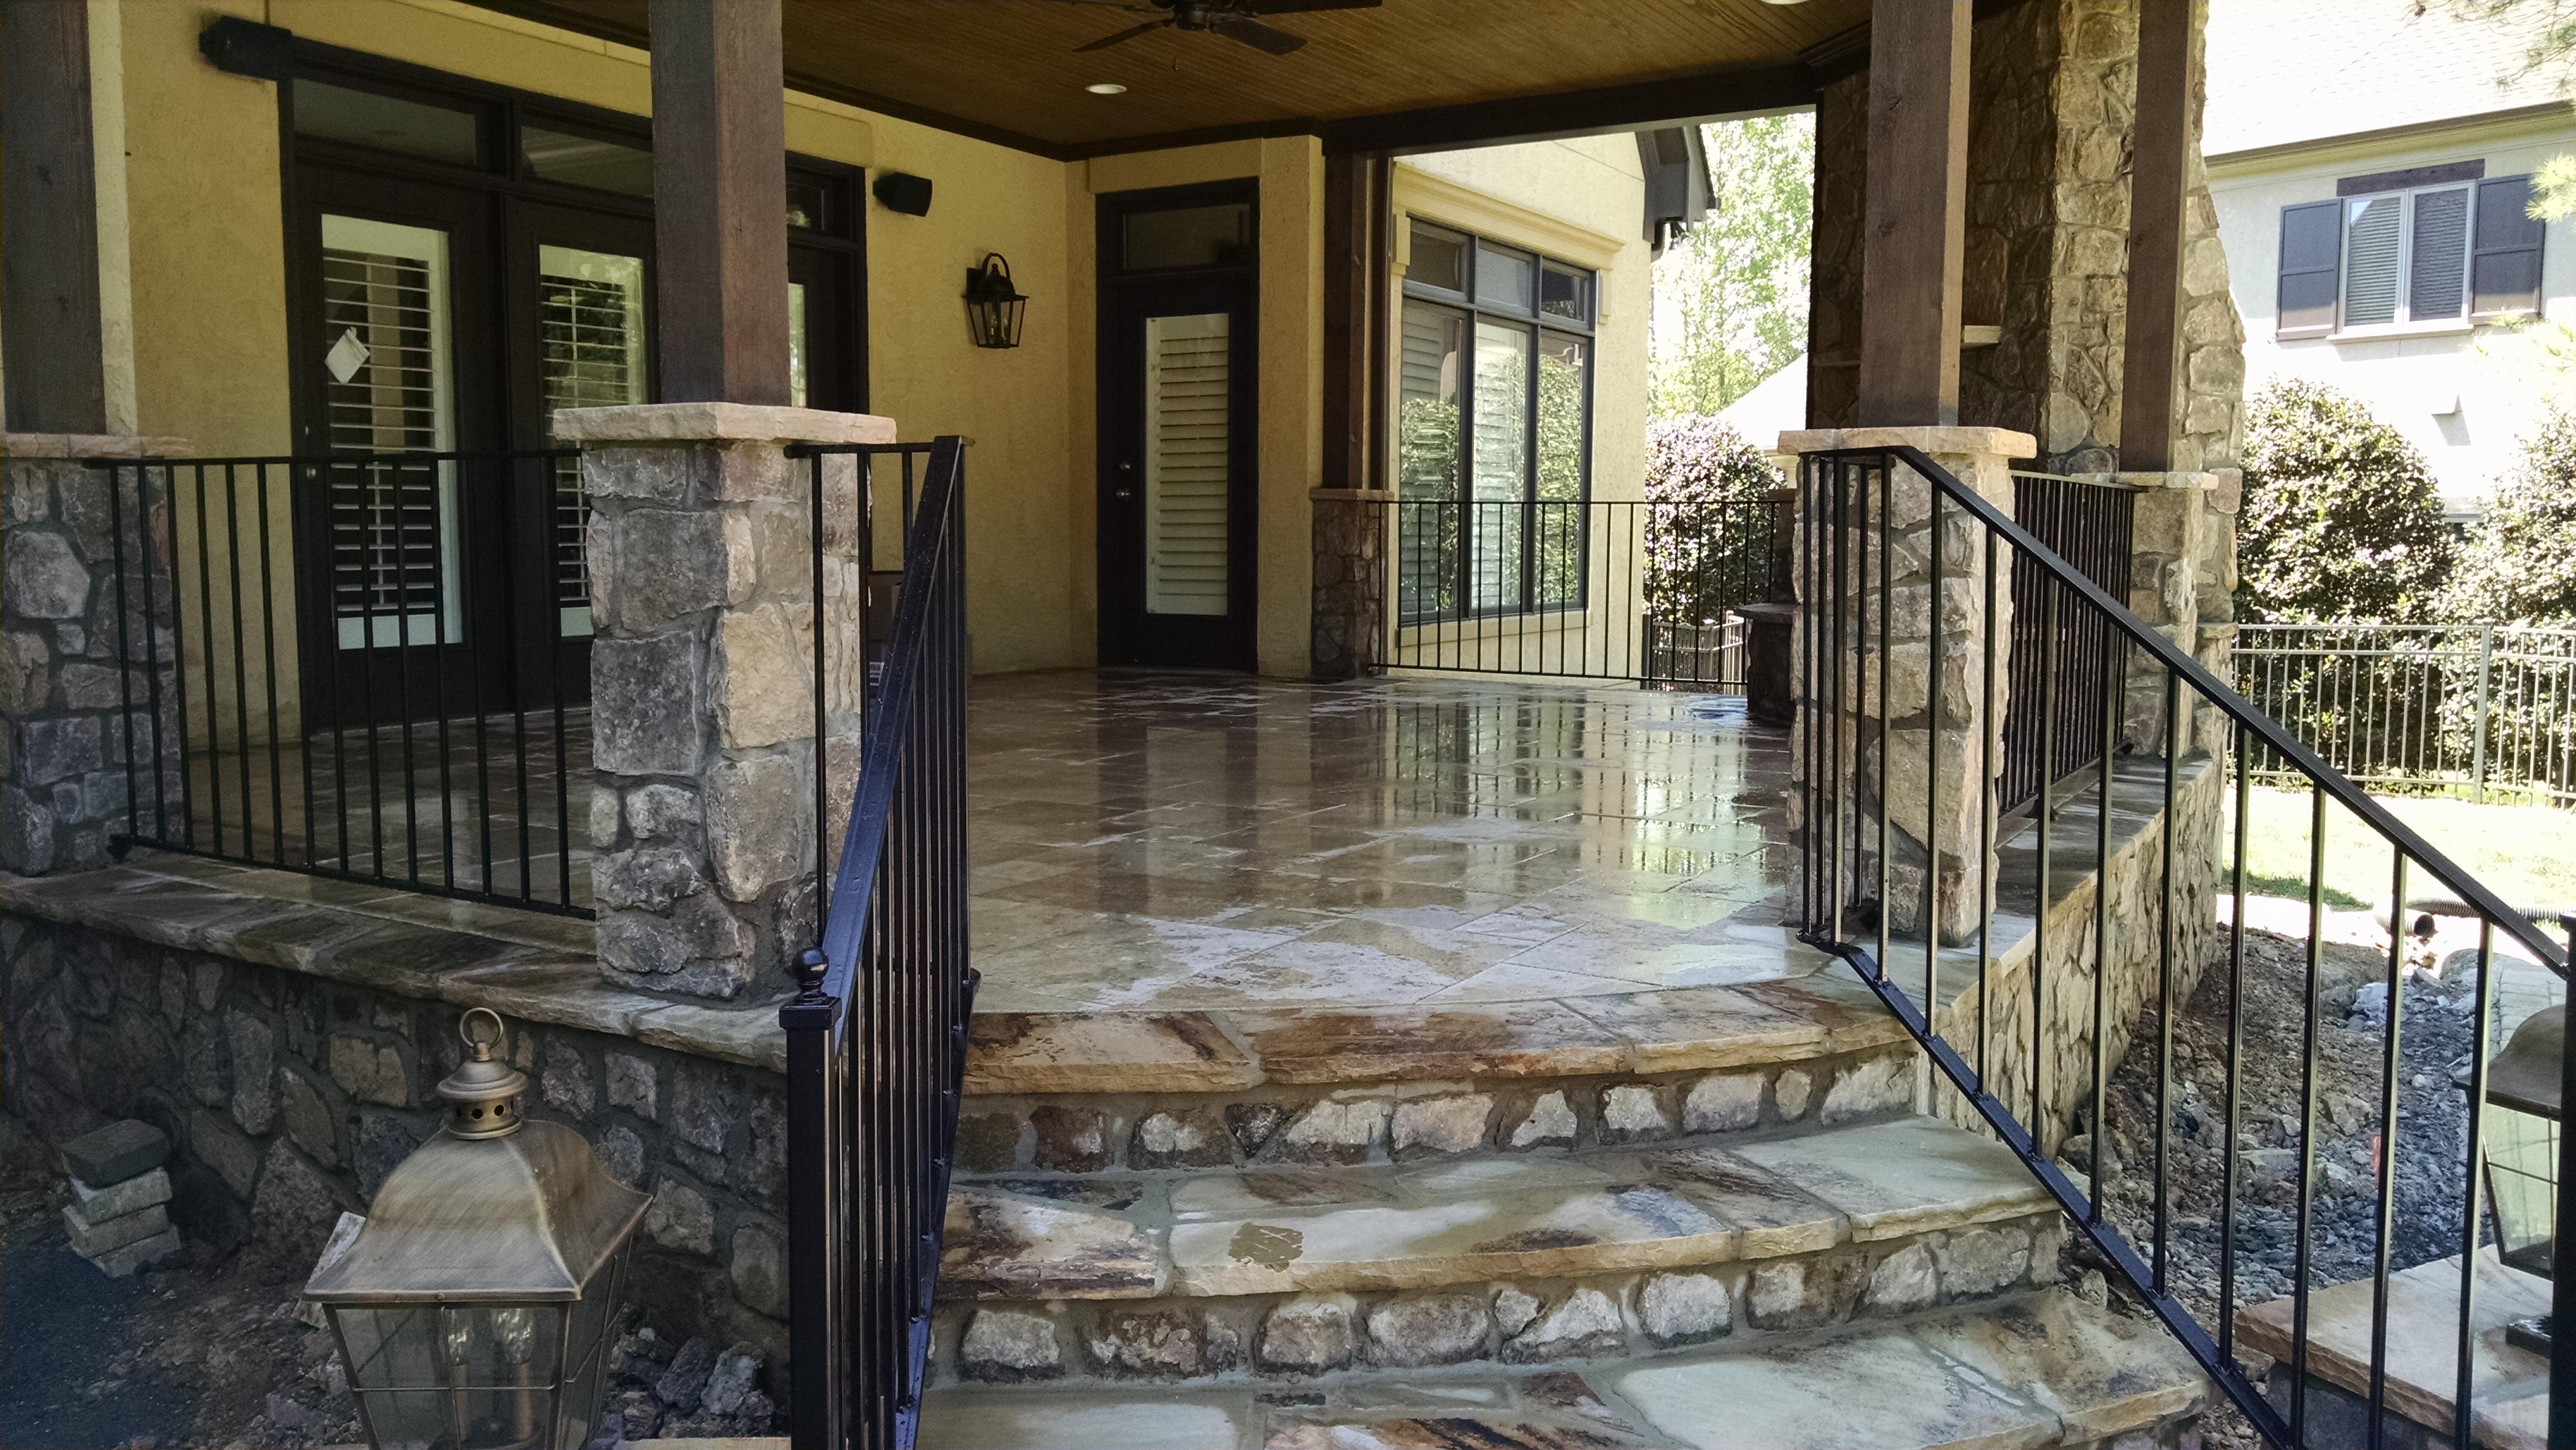 Custom fabricated iron railings